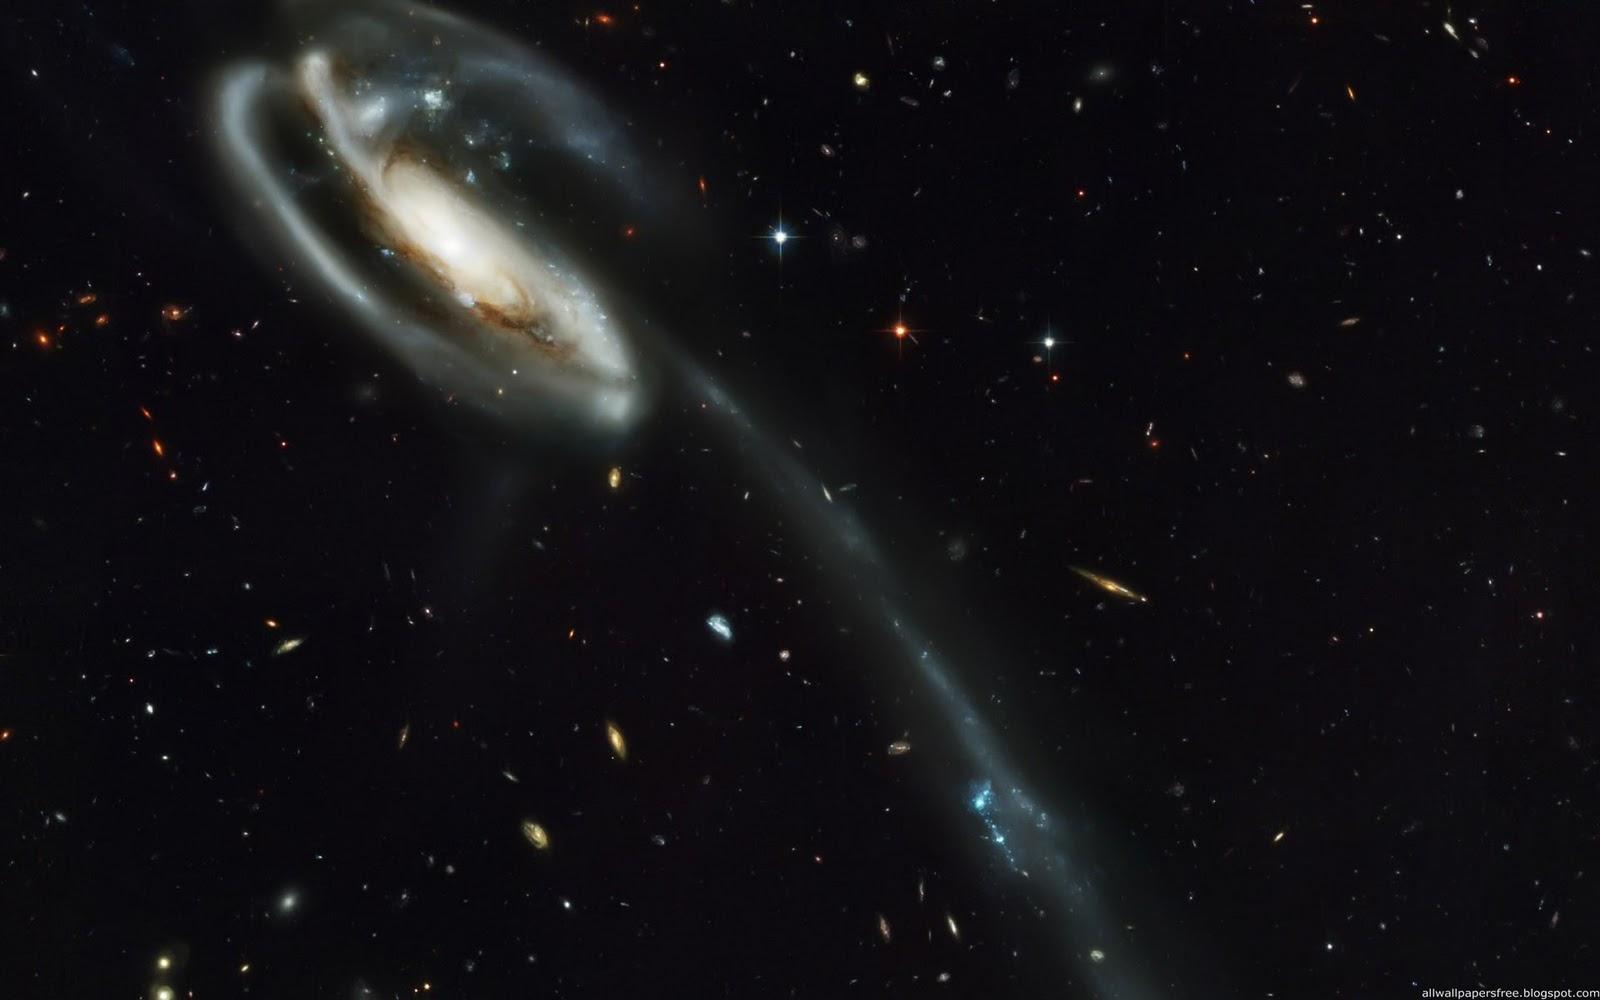 hq galaxy nasa - photo #23